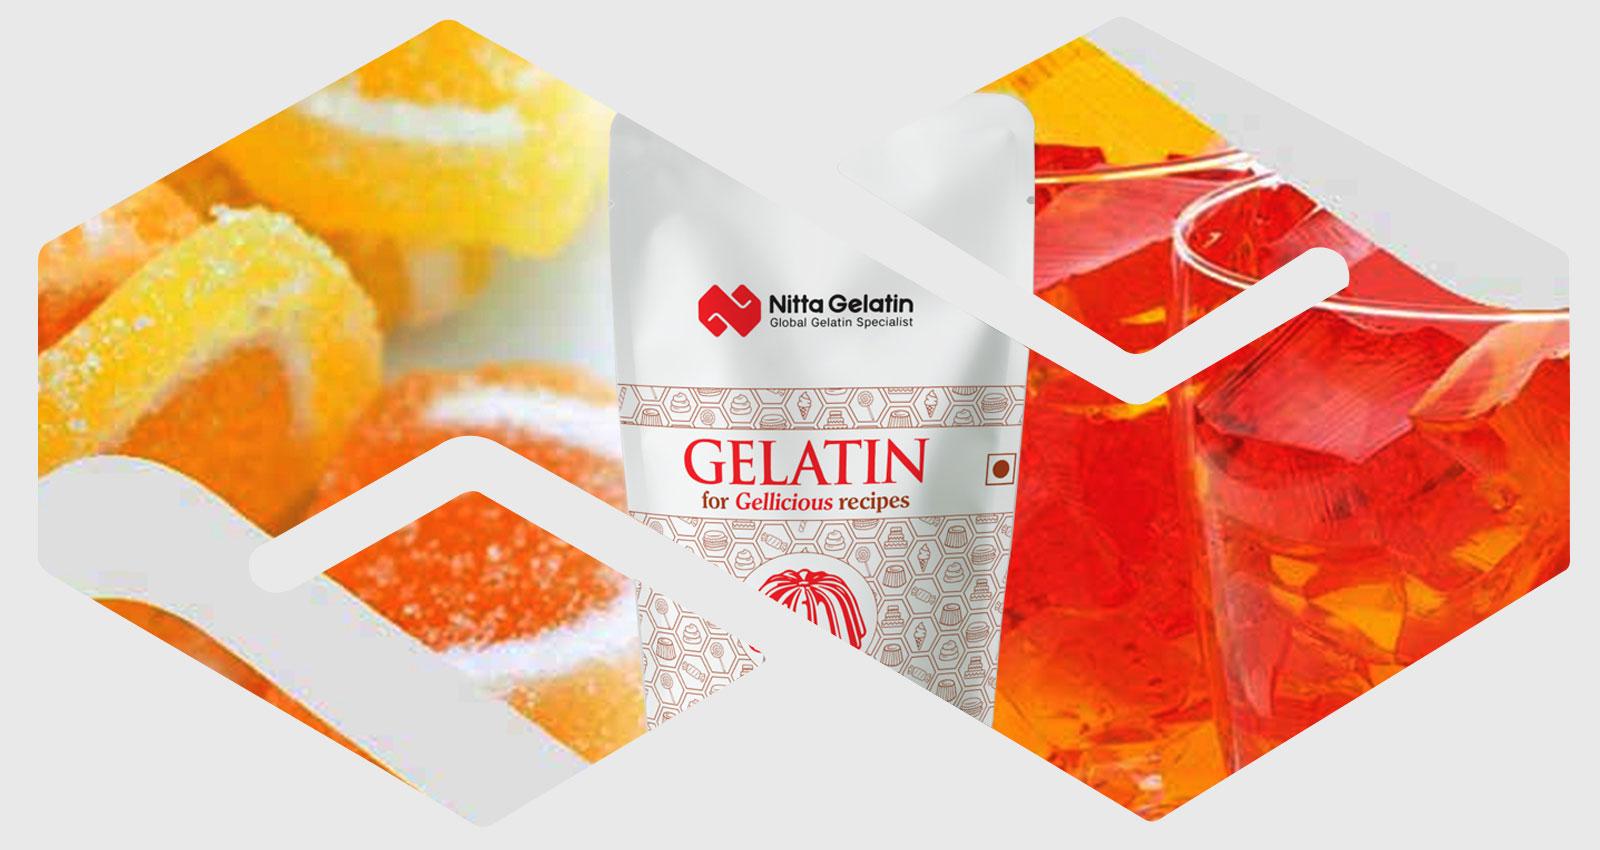 Gelatin for |Gellicious Recipes